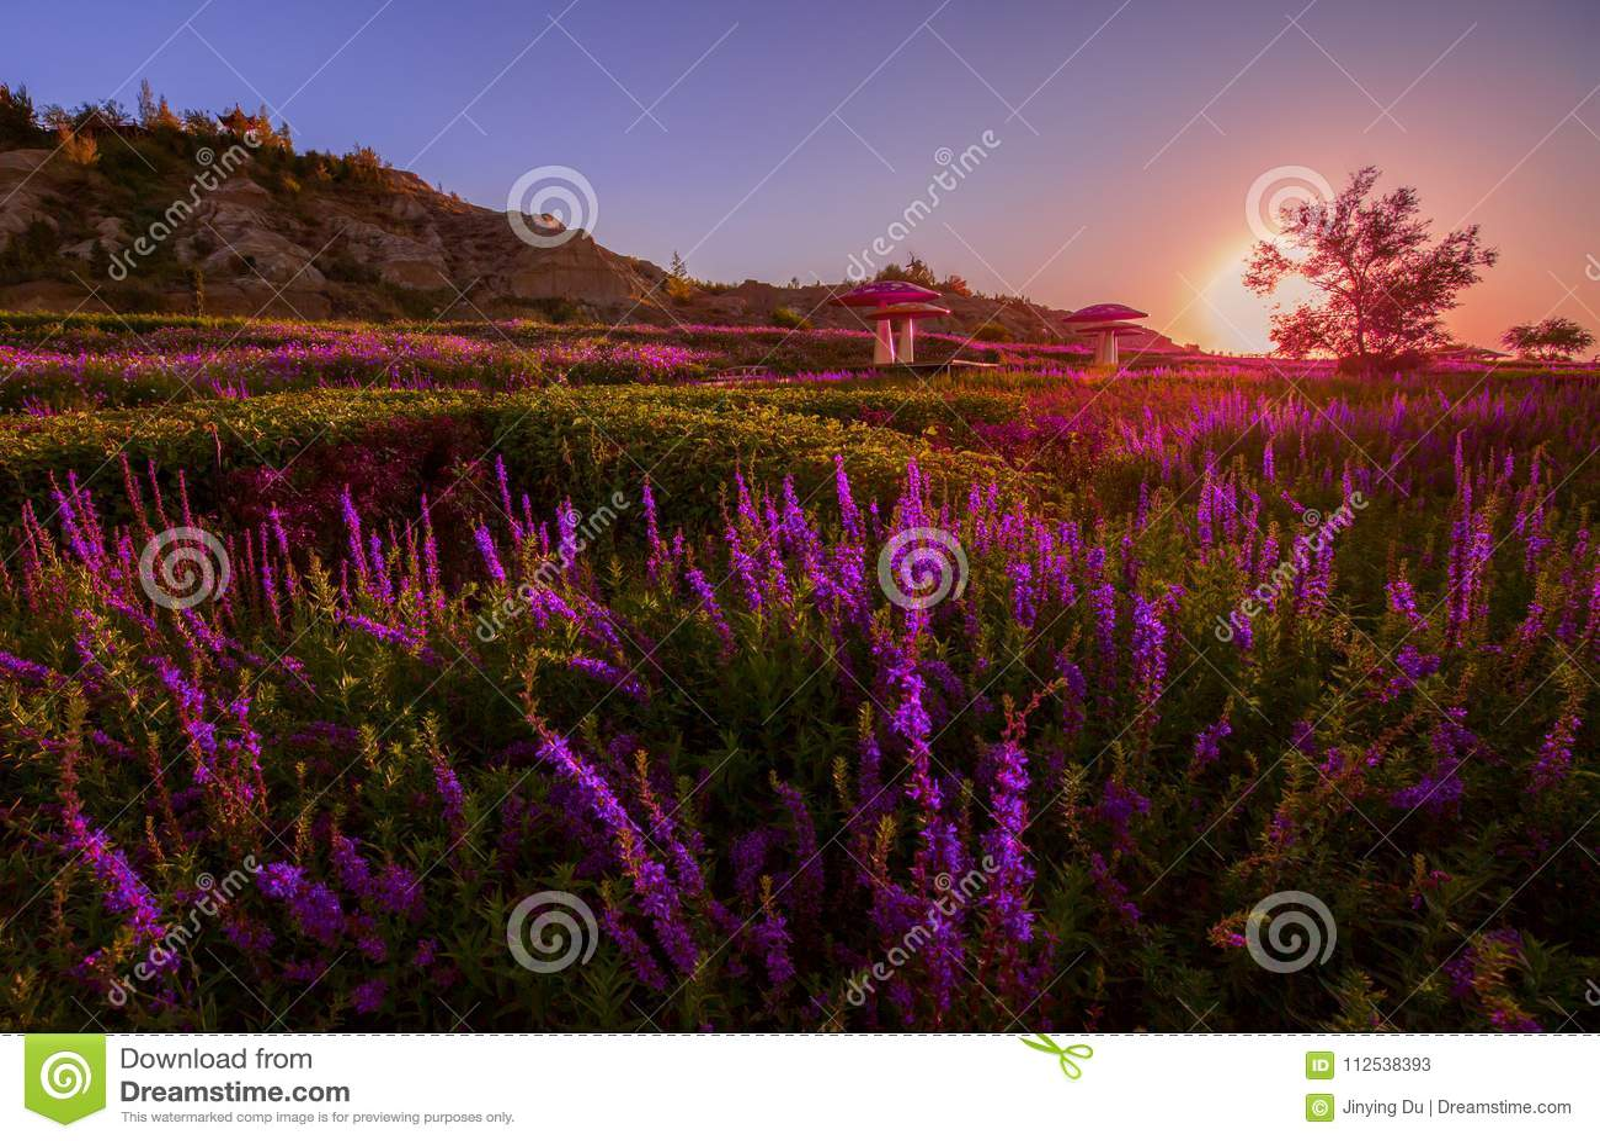 Lavender planted at foot of Tianshan mountain China